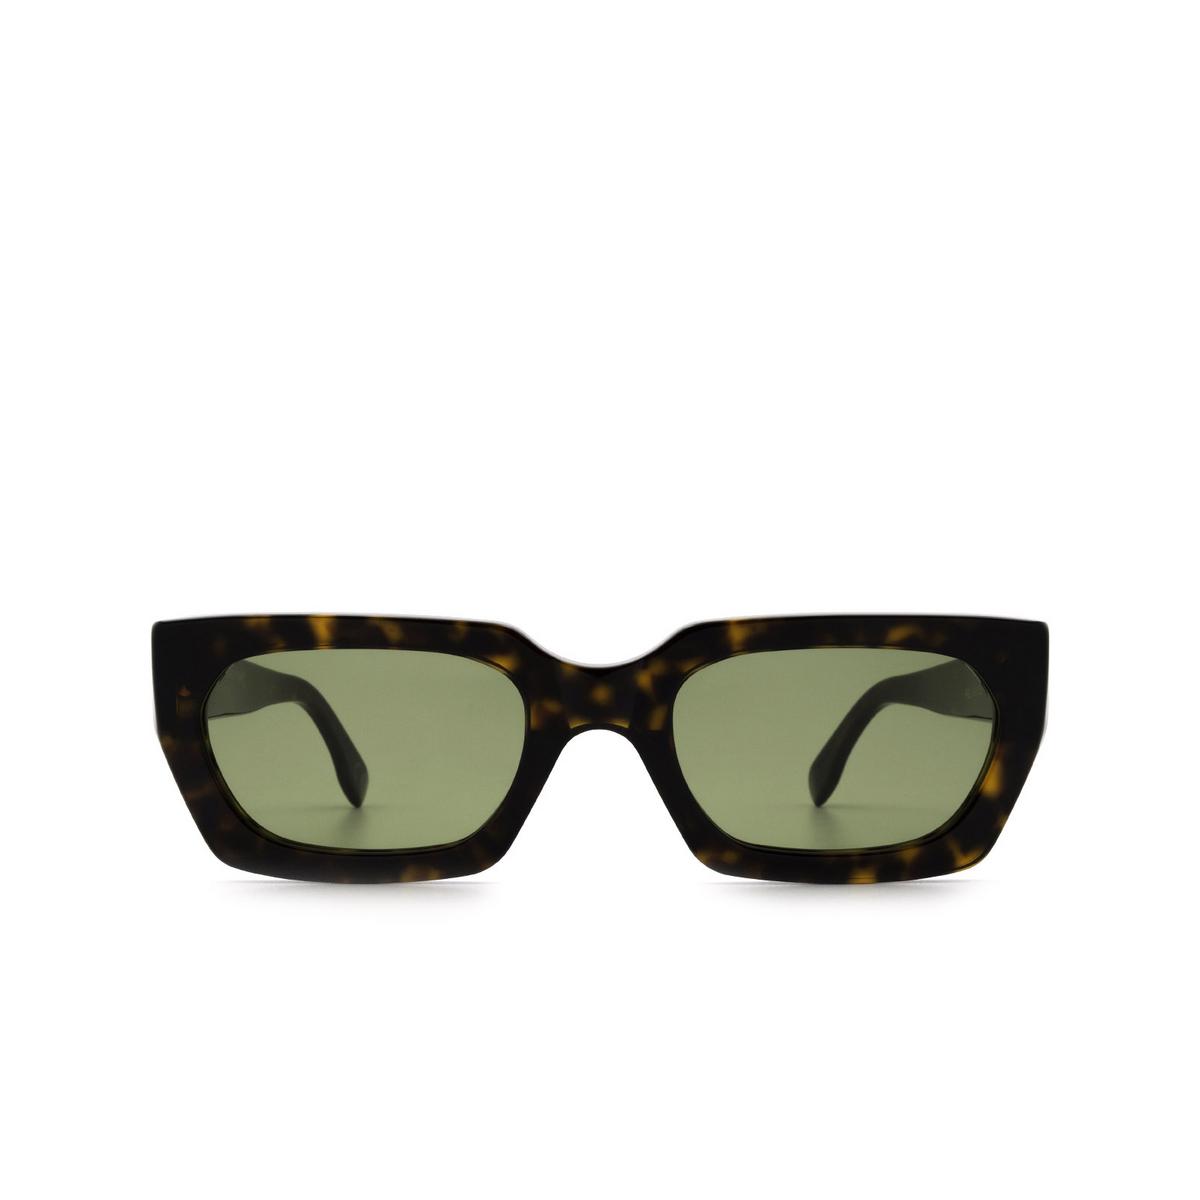 Retrosuperfuture® Rectangle Sunglasses: Teddy color 3627 9RZ - front view.